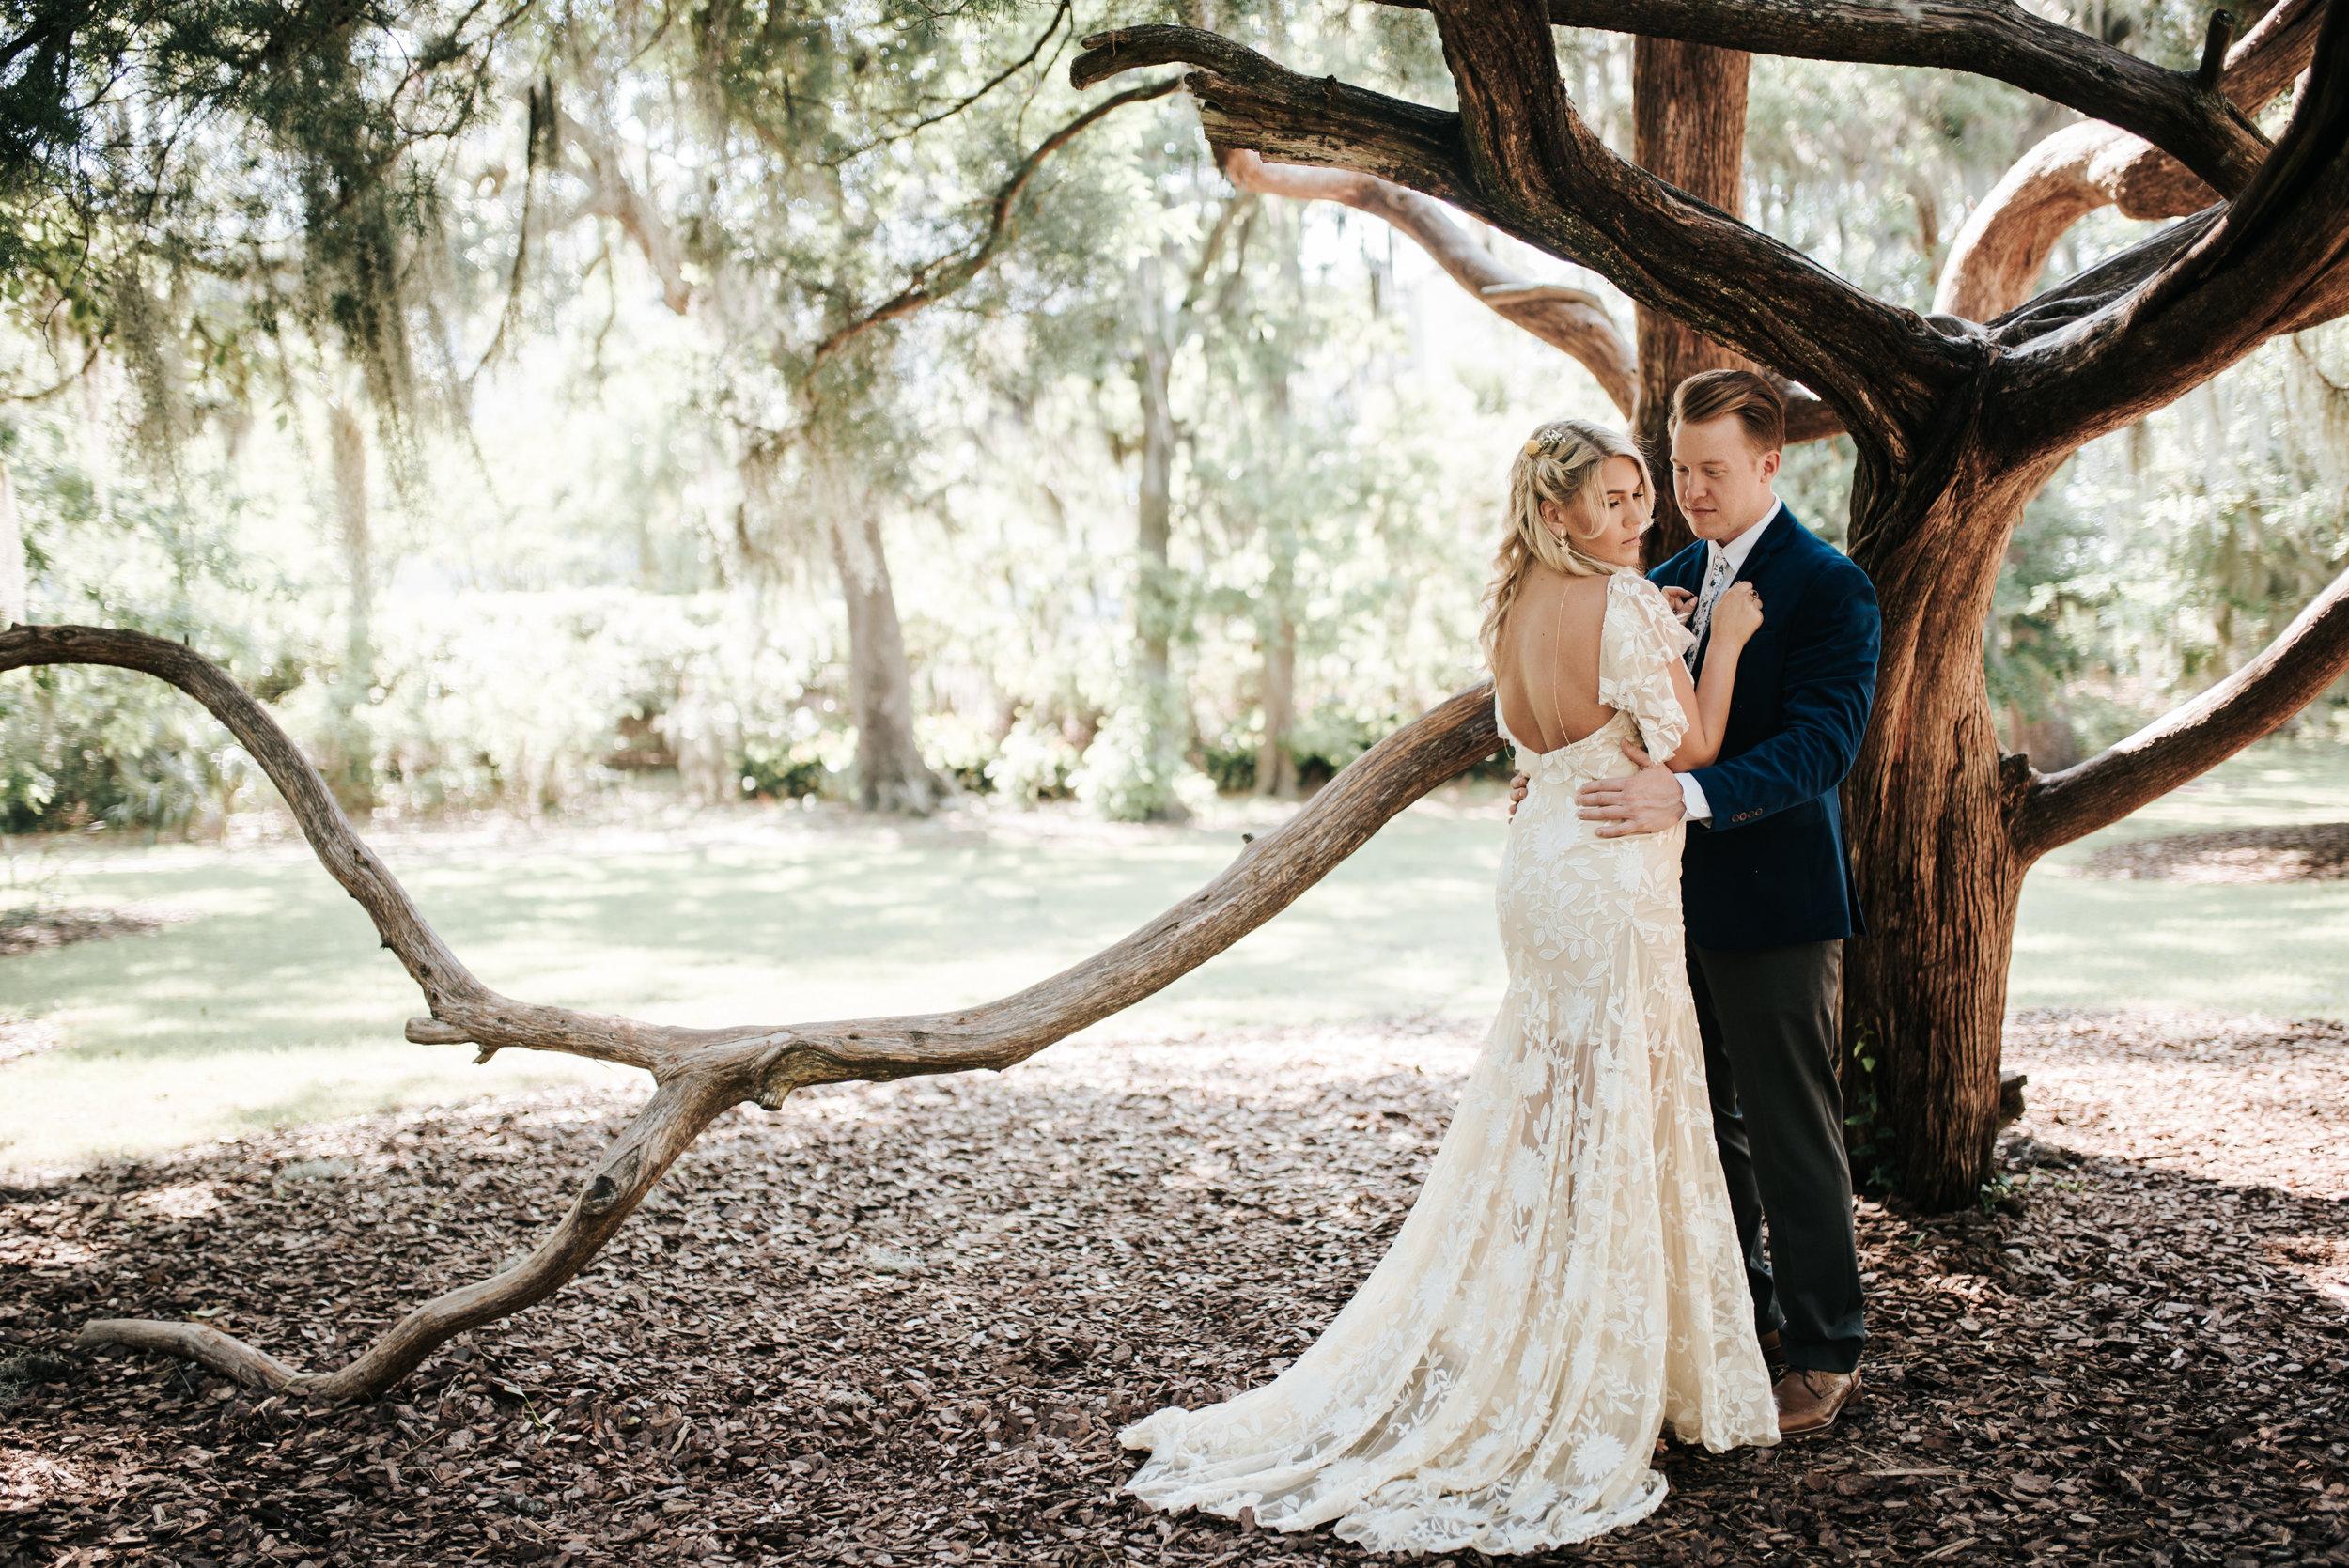 zayda-collin-panama-city-beach-bohemian-hippie-wedding-photography-lisa-frank-inspired-bride-groom-portraits-first-look-135.jpg